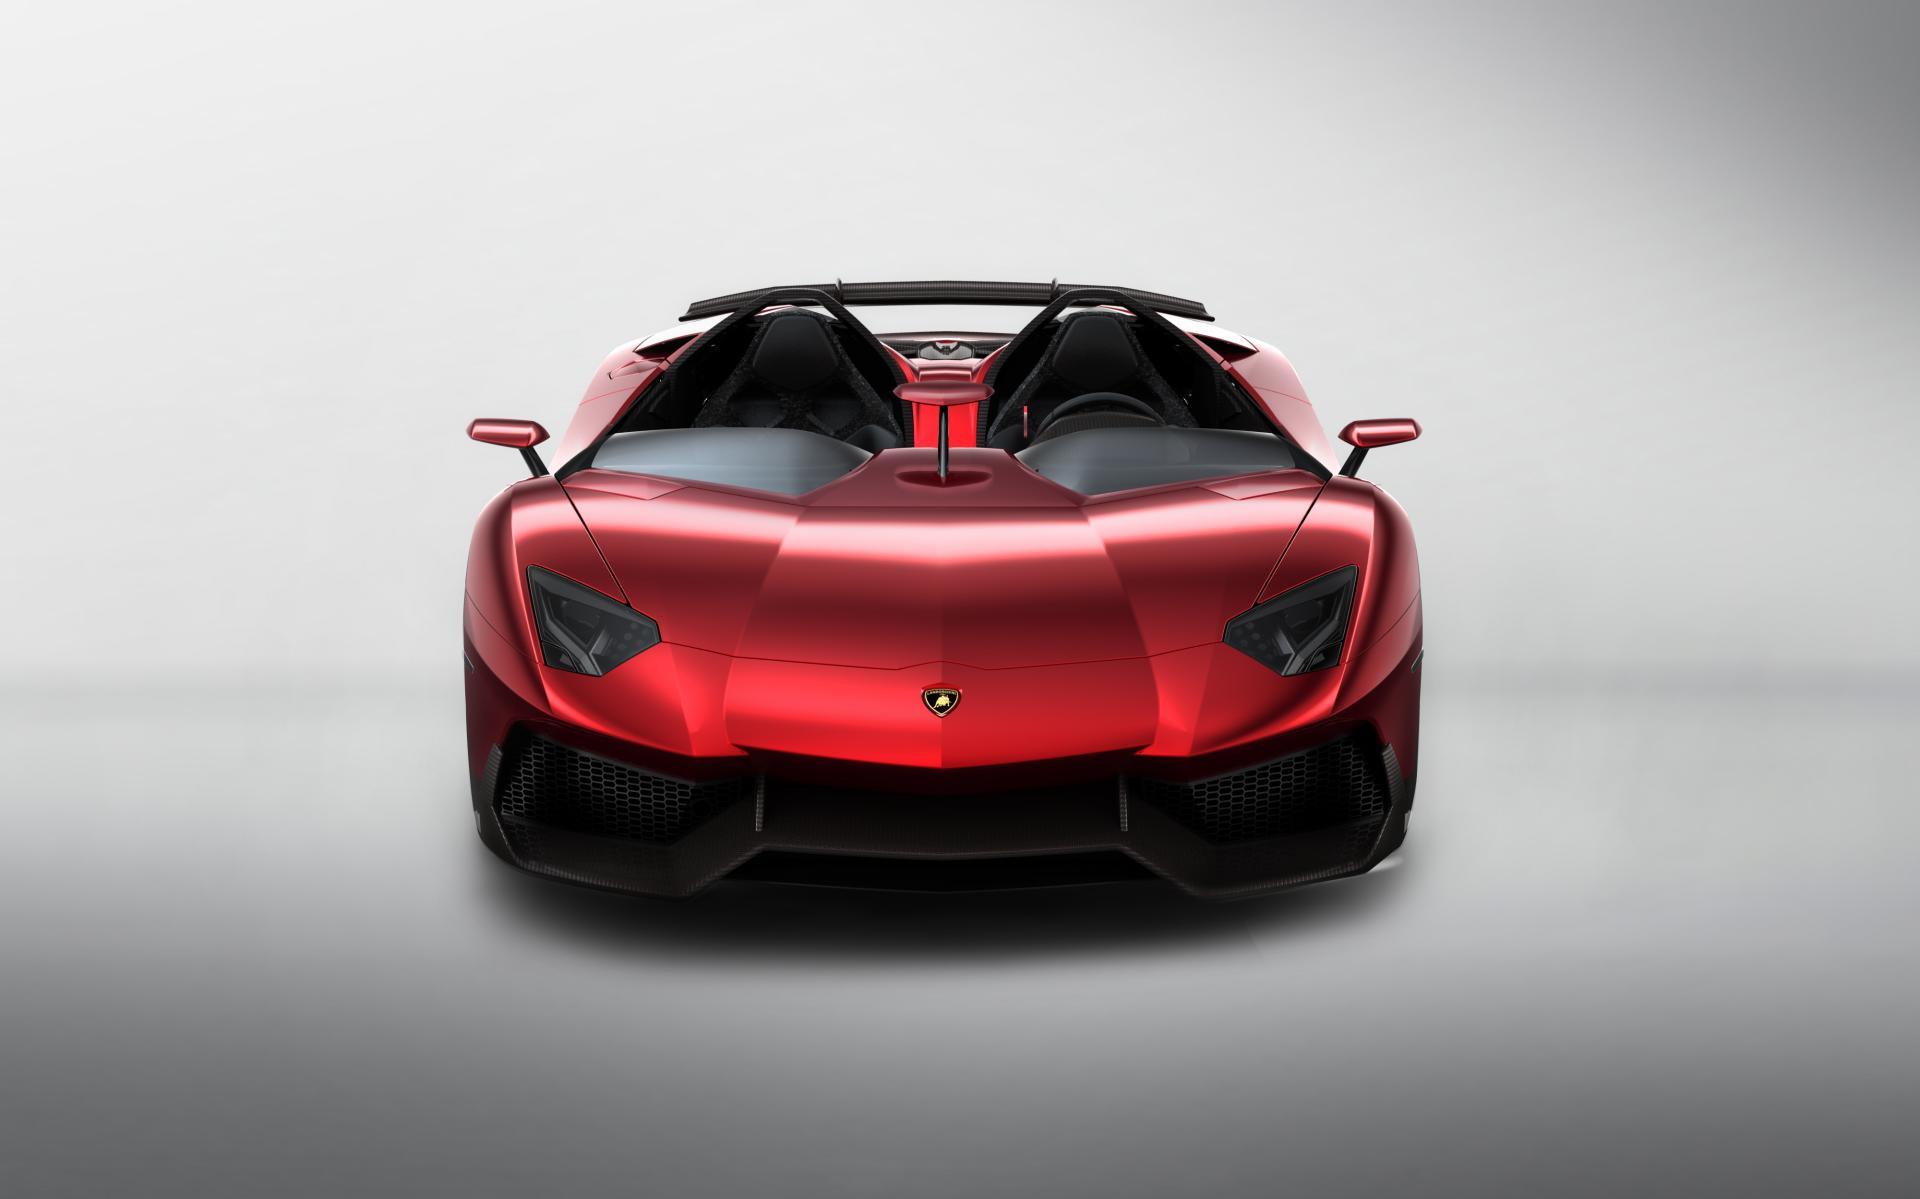 2012 Lamborghini Aventador J News And Information